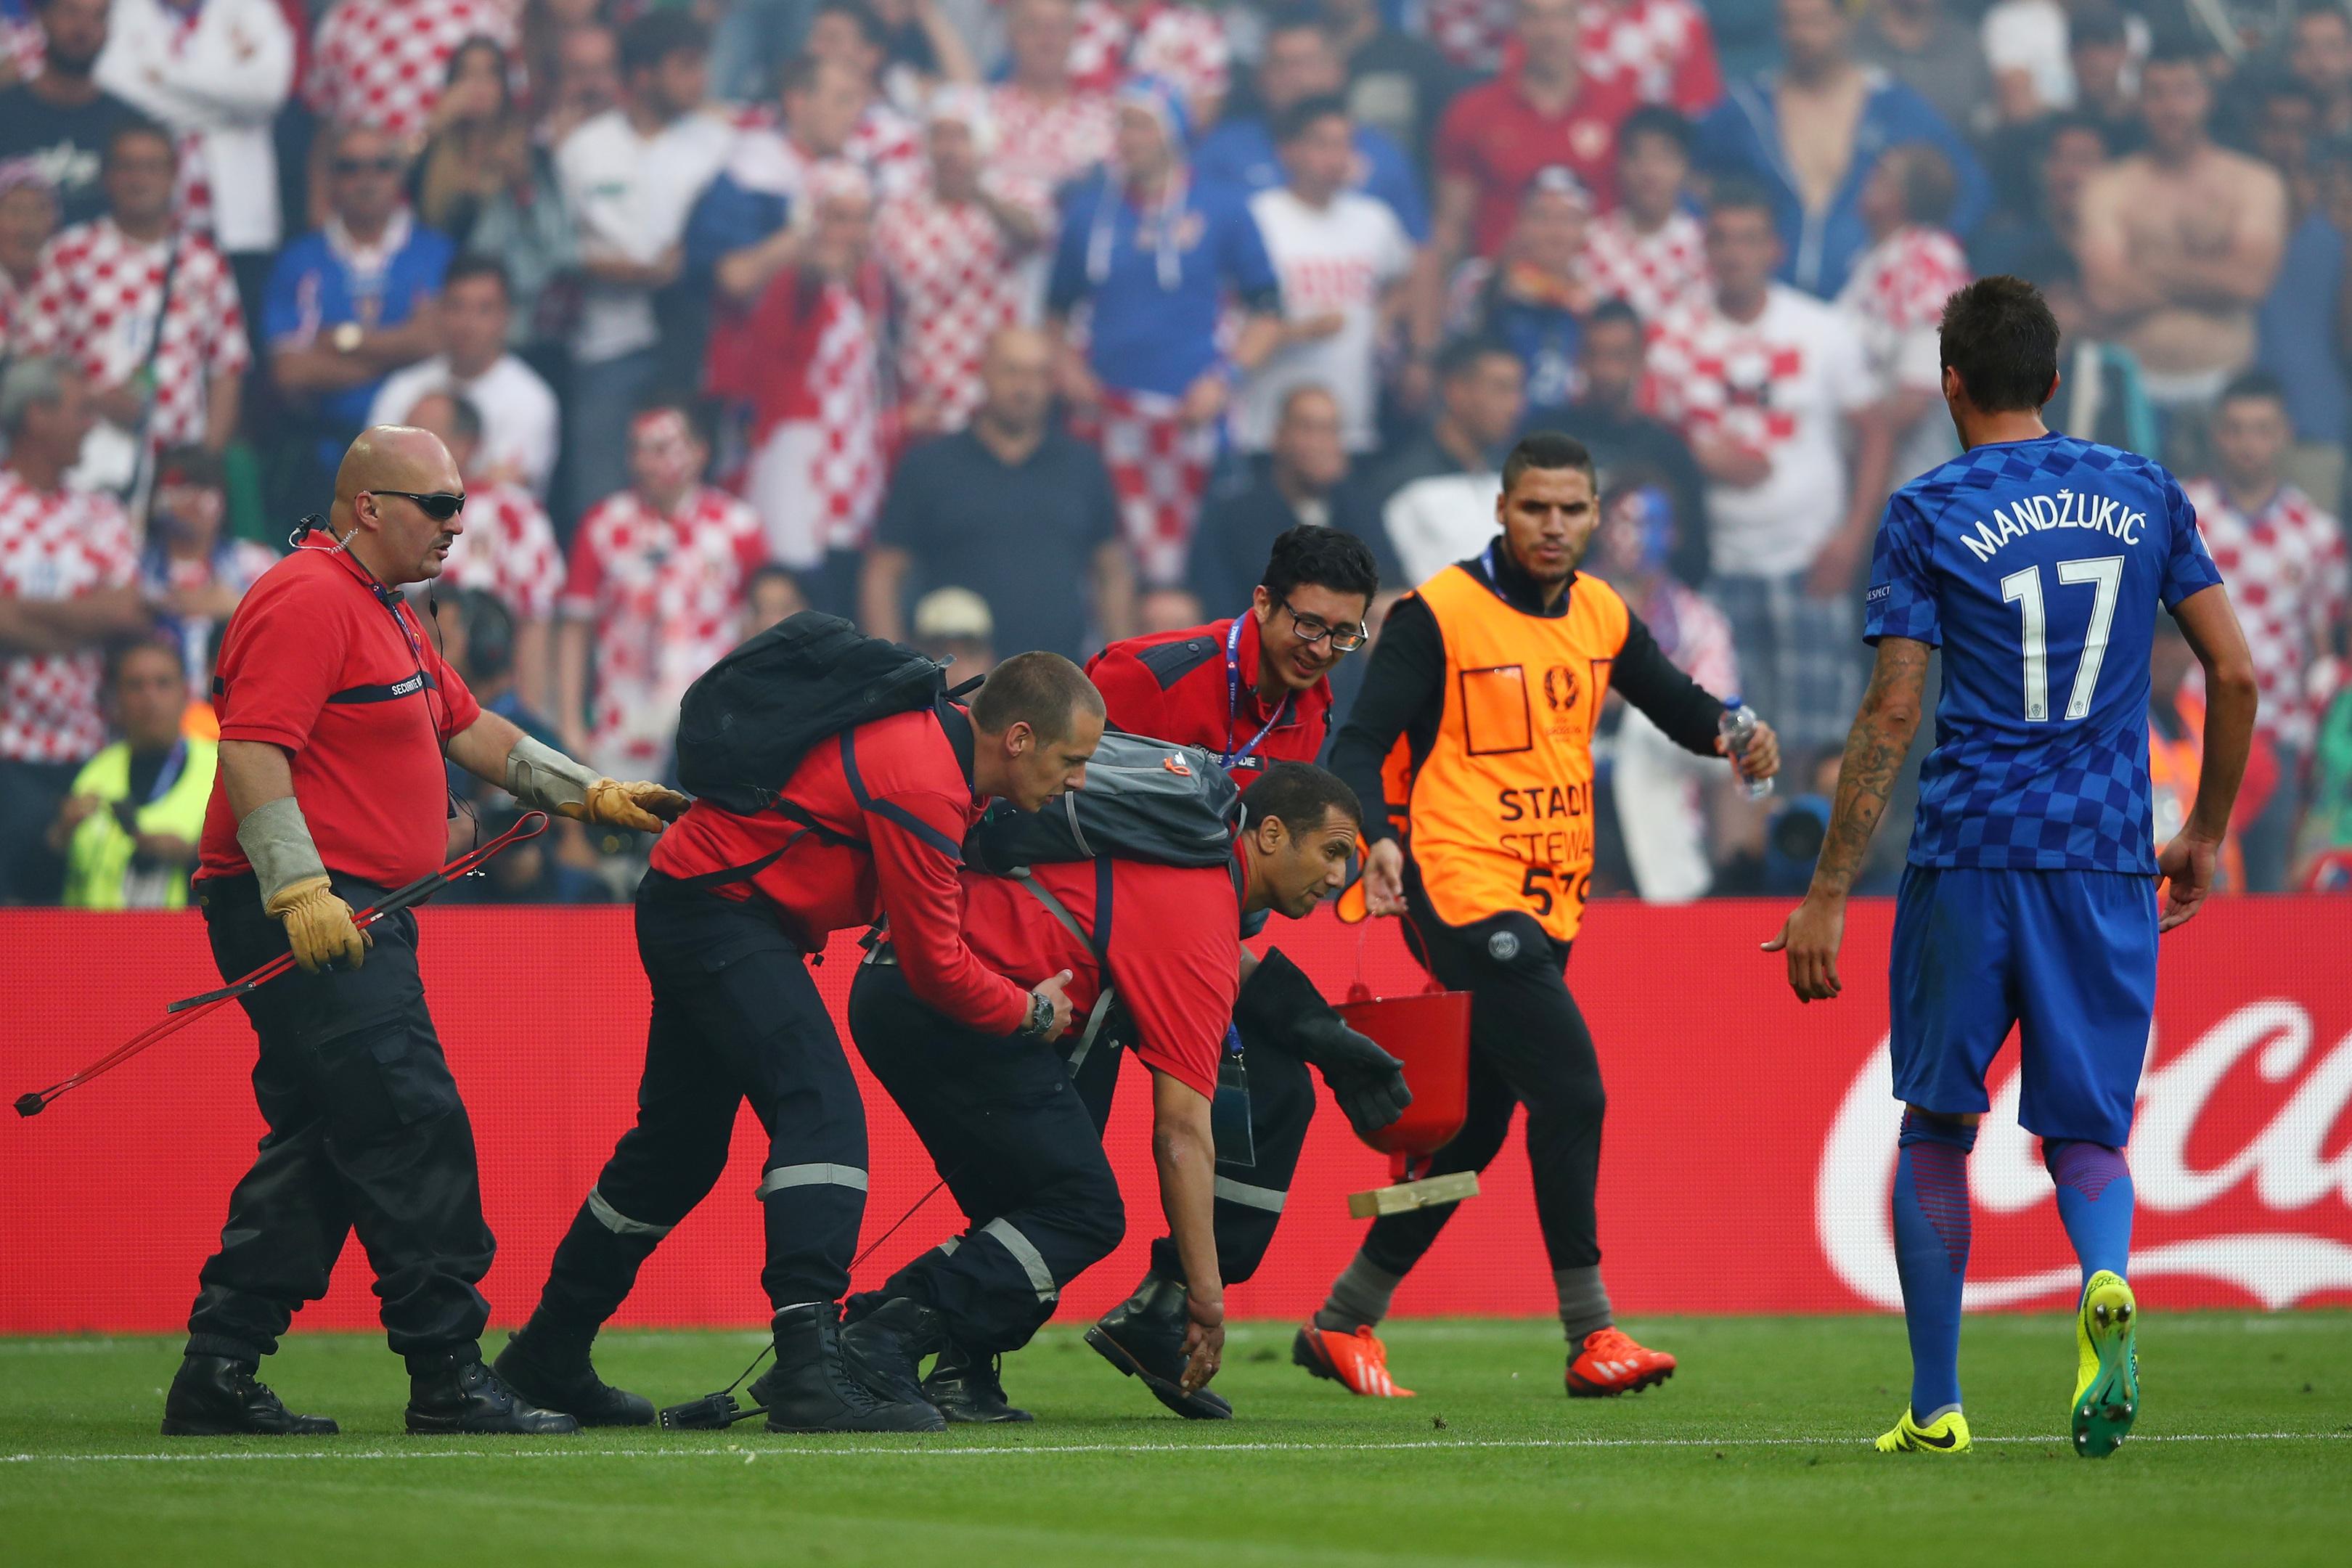 Czech Republic v Croatia - Group D: UEFA Euro 2016